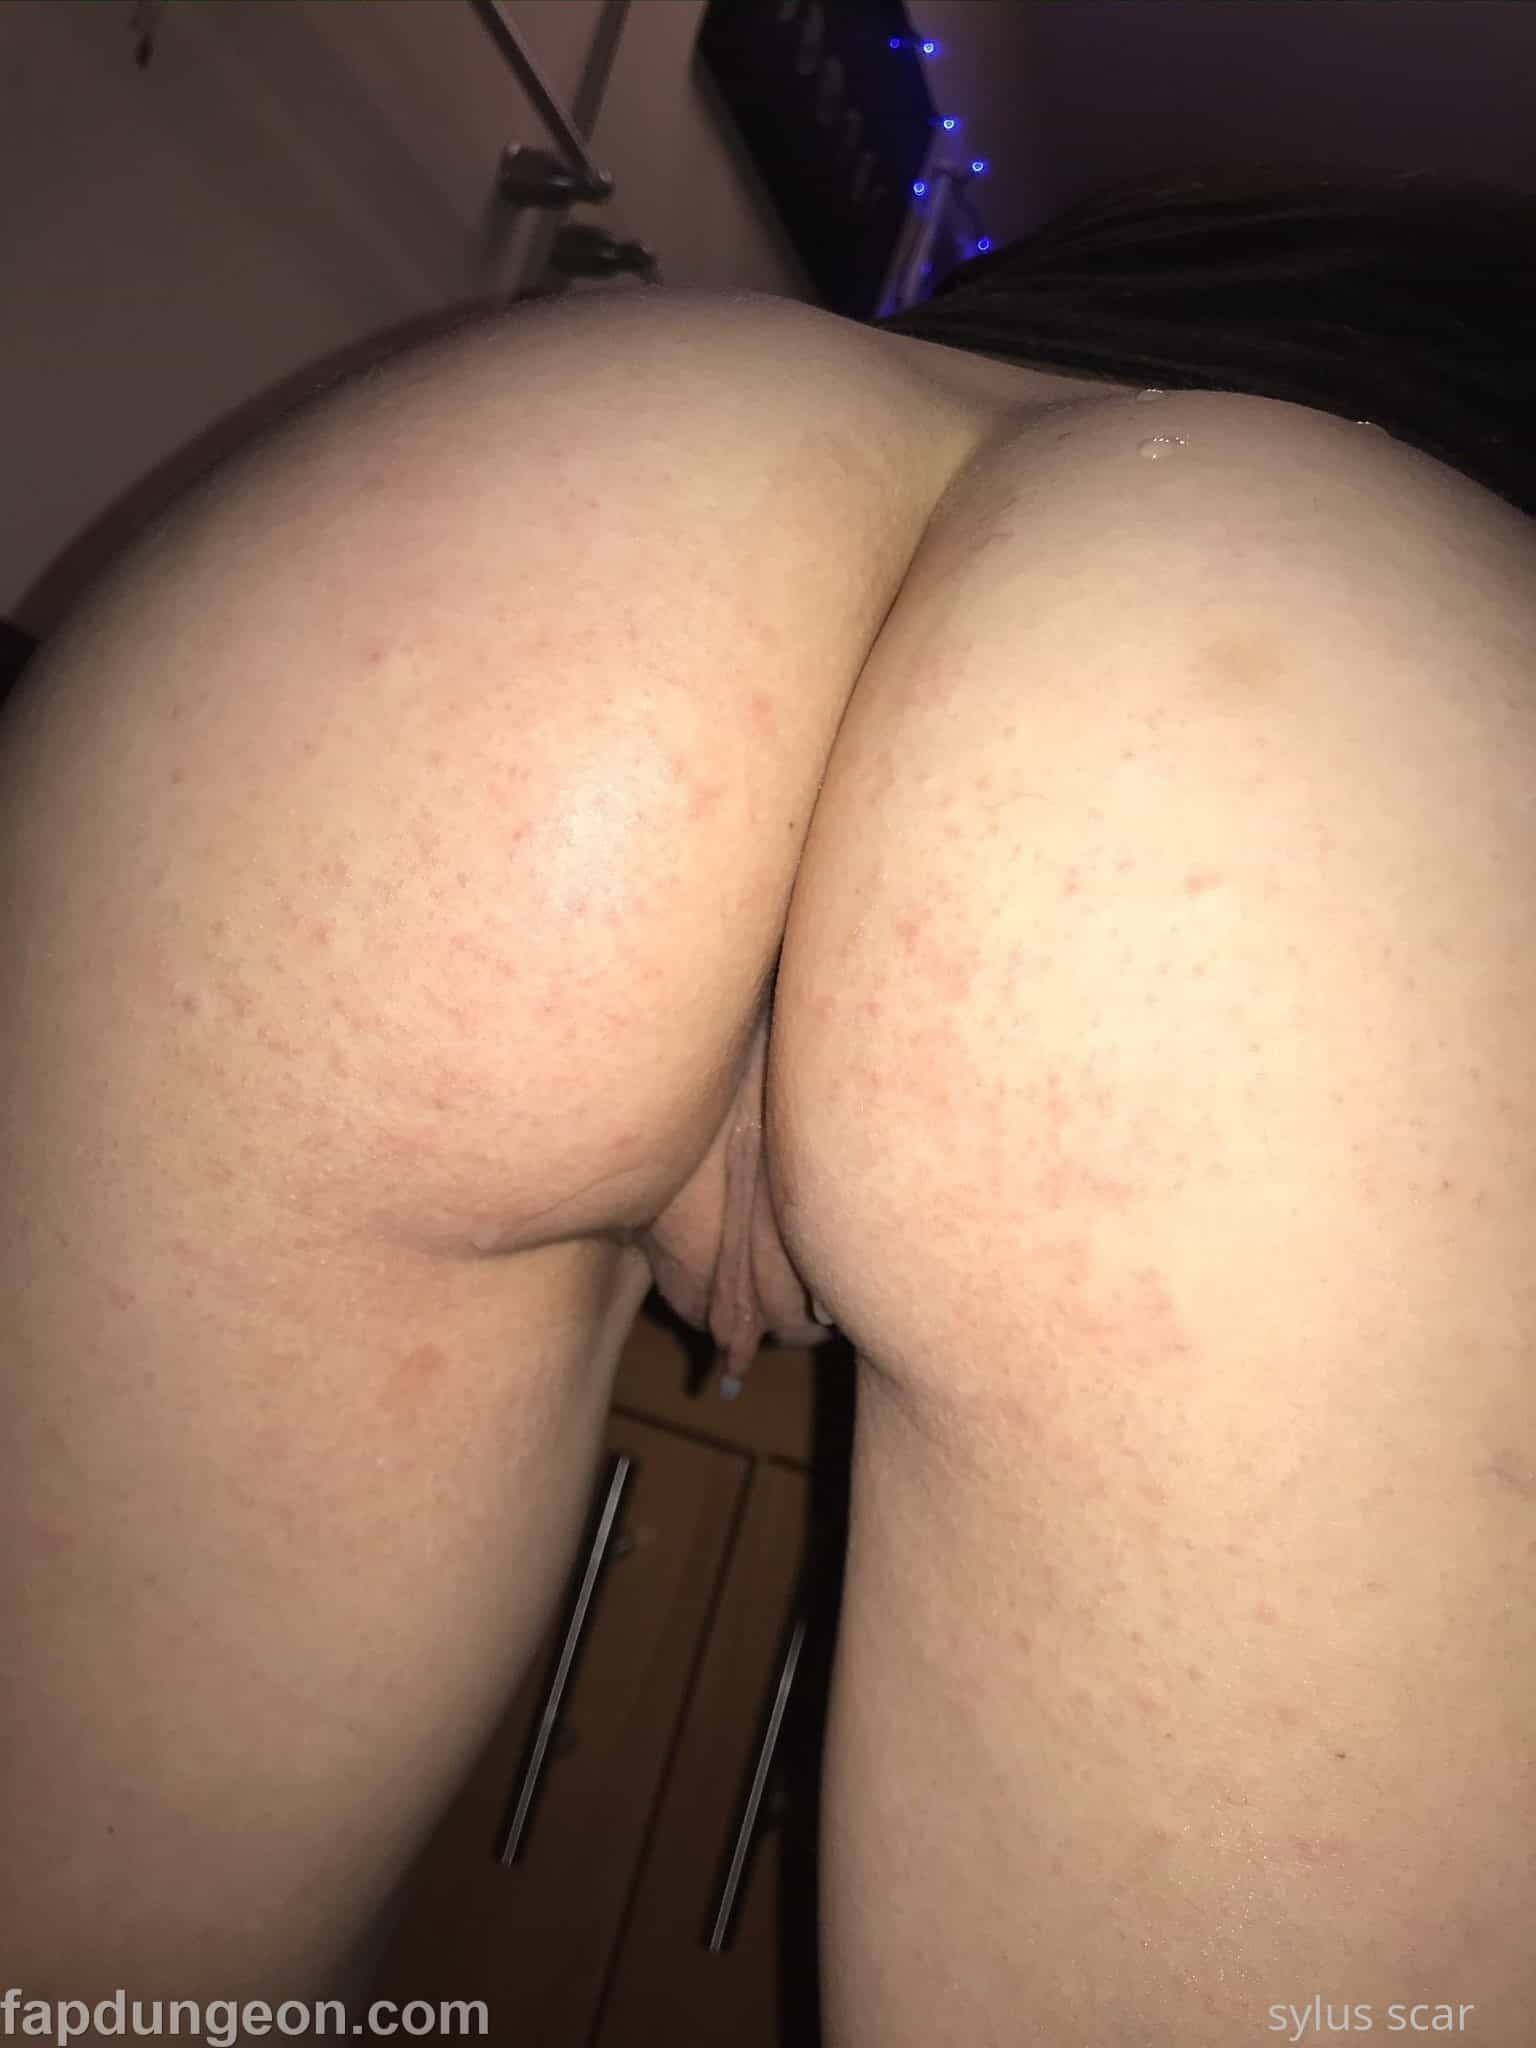 Sylus Scar Ass